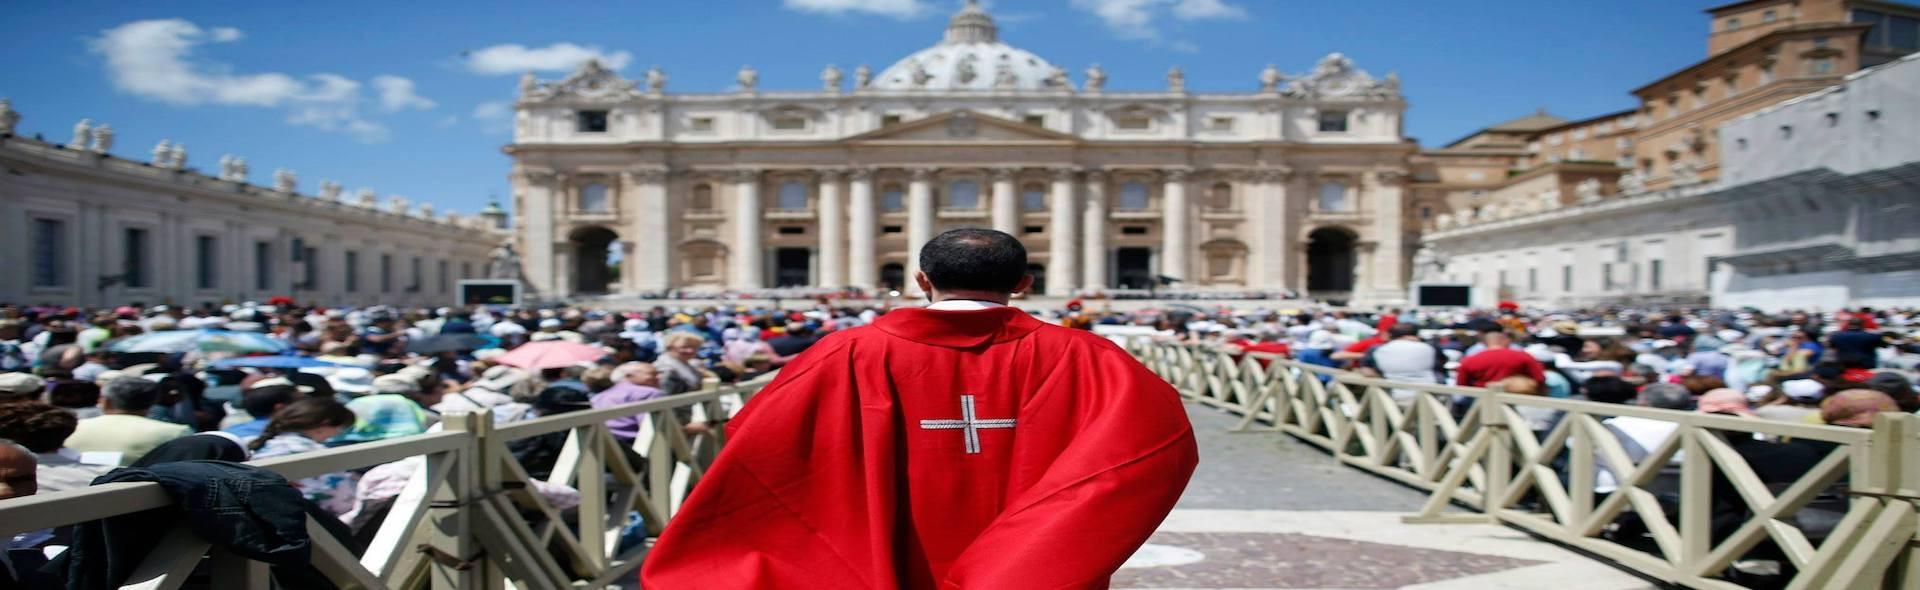 Pellegrinaggio a Roma Week End Aprile